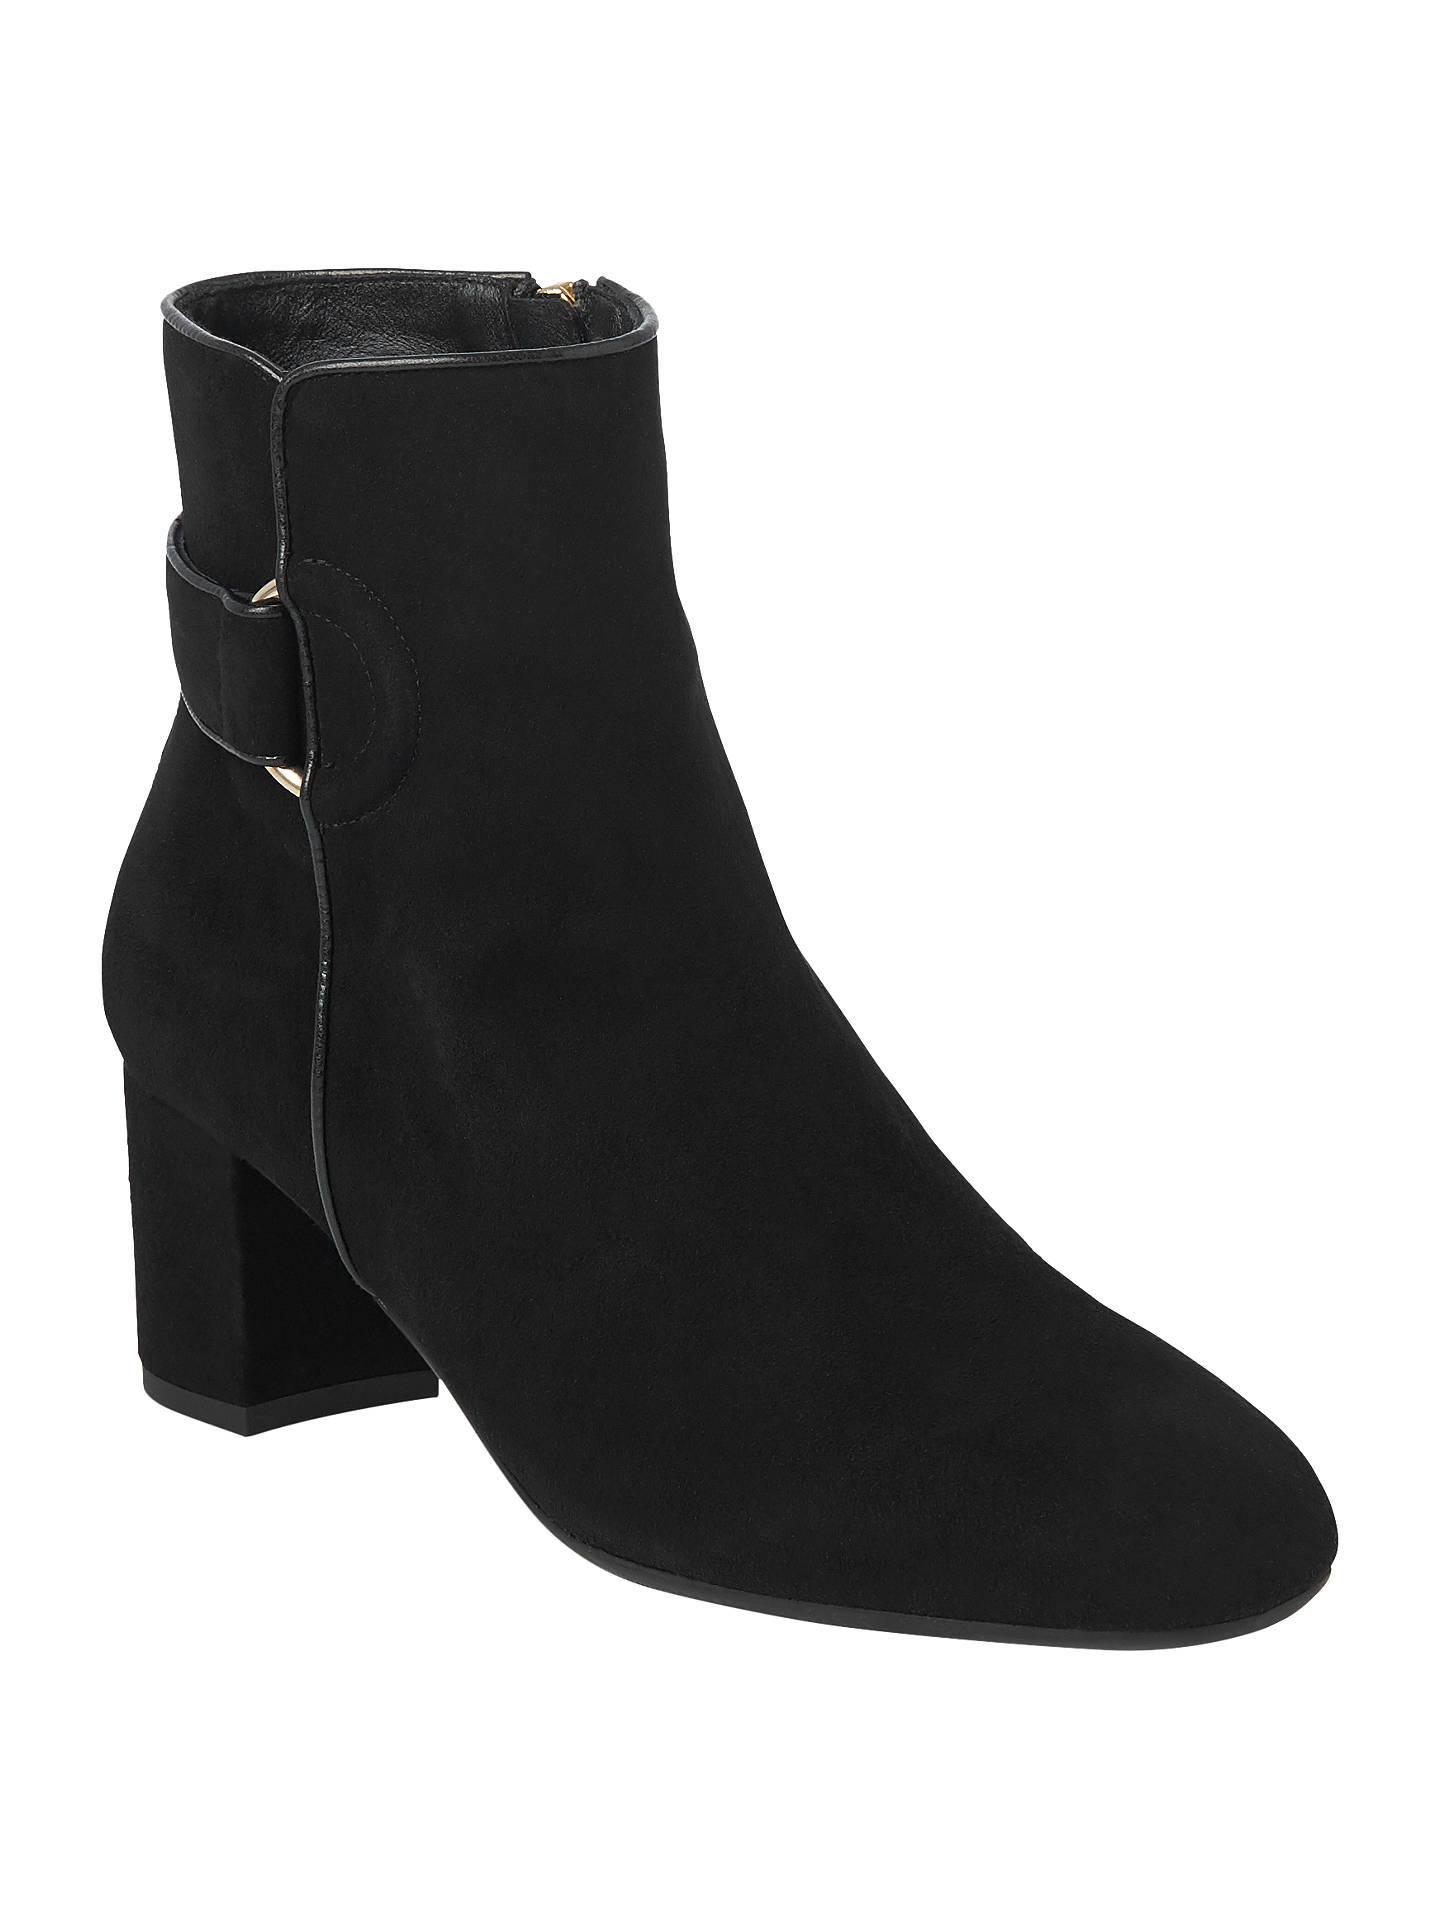 44568bd54bb L.K. Bennett Abi Block Heeled Ankle Boots at John Lewis   Partners